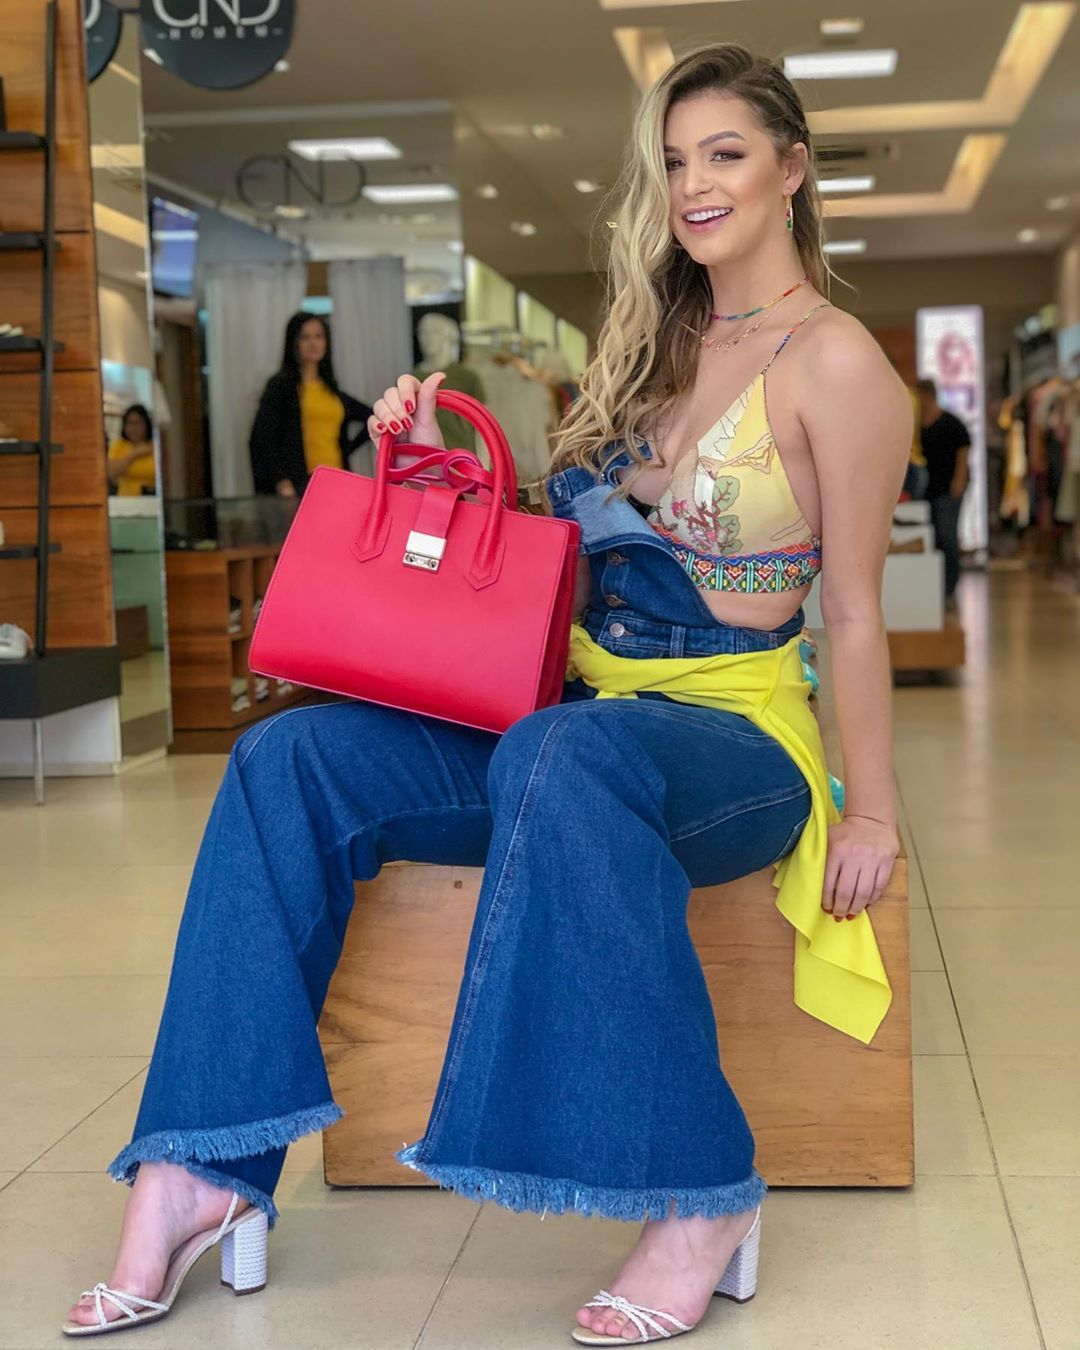 maria gabriela batistela, miss brasil terra 2019. - Página 2 67166910